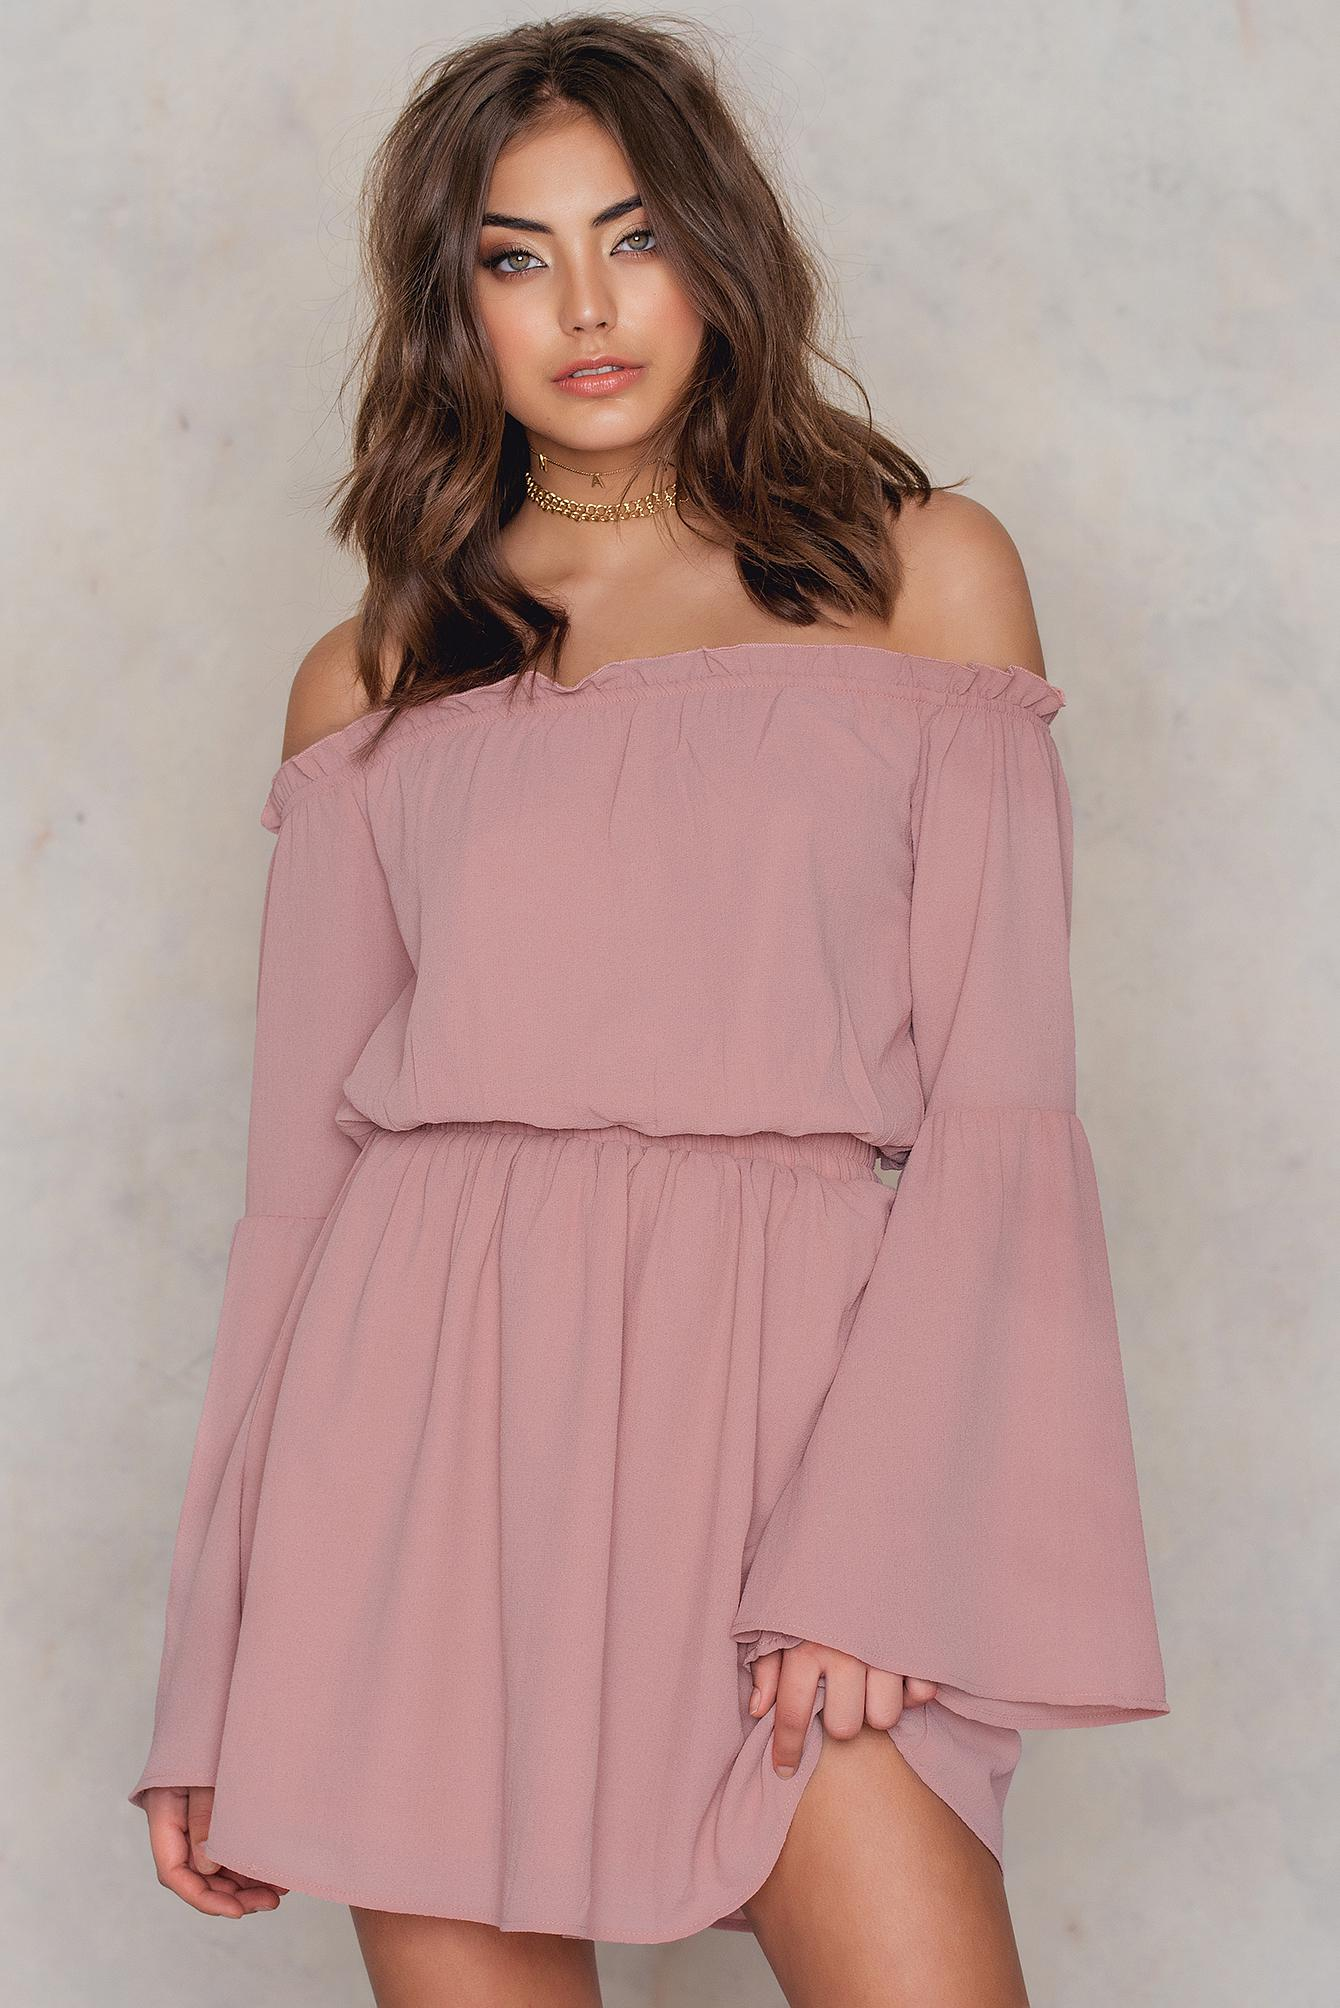 cc266f8a140 NA-KD Pink Wide Sleeve Off Shoulder Dress